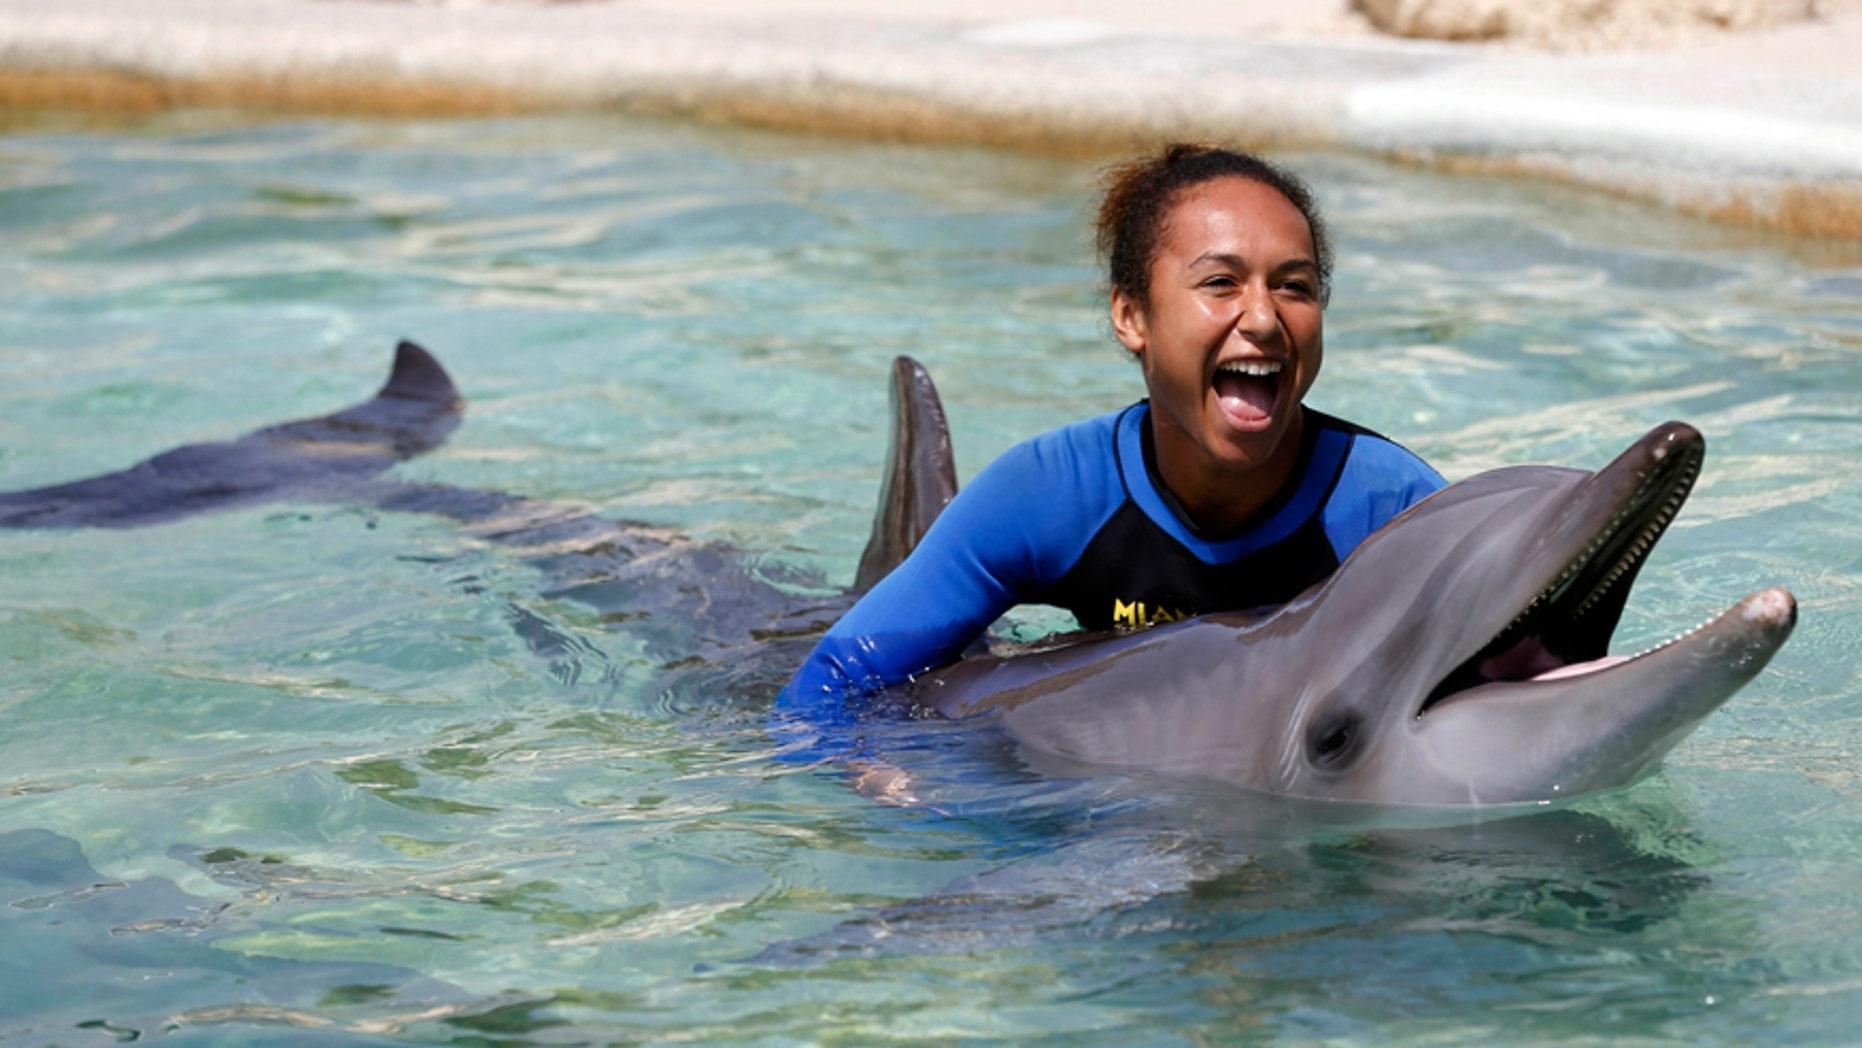 Aquariums say PETA convinced TripAdvisor to stop booking certain attractions.